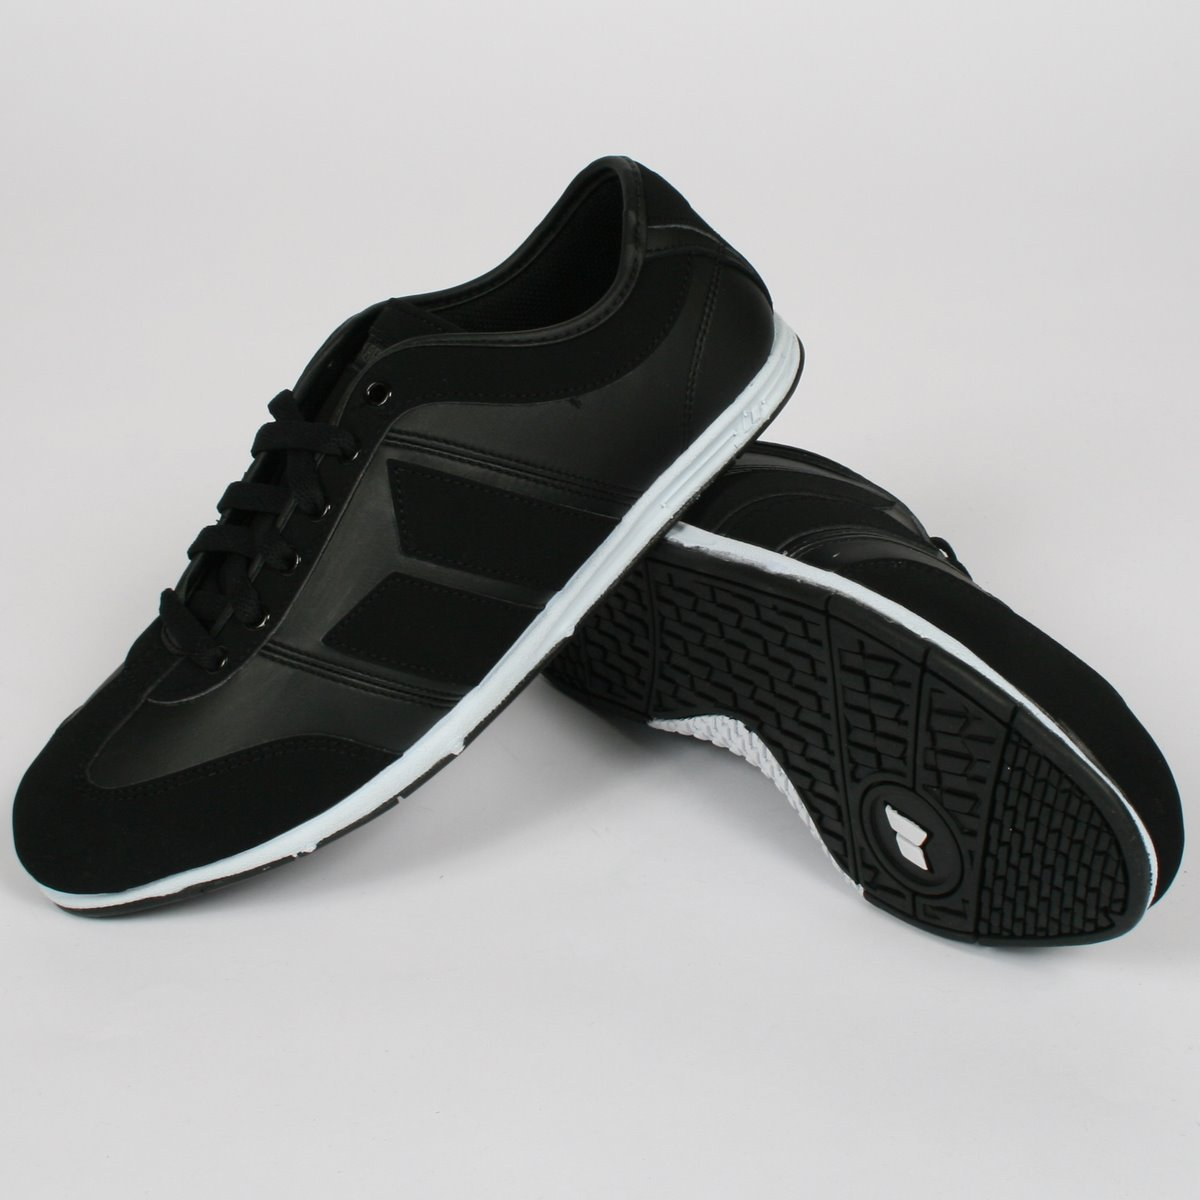 Macbeth Brighton Shoes Review